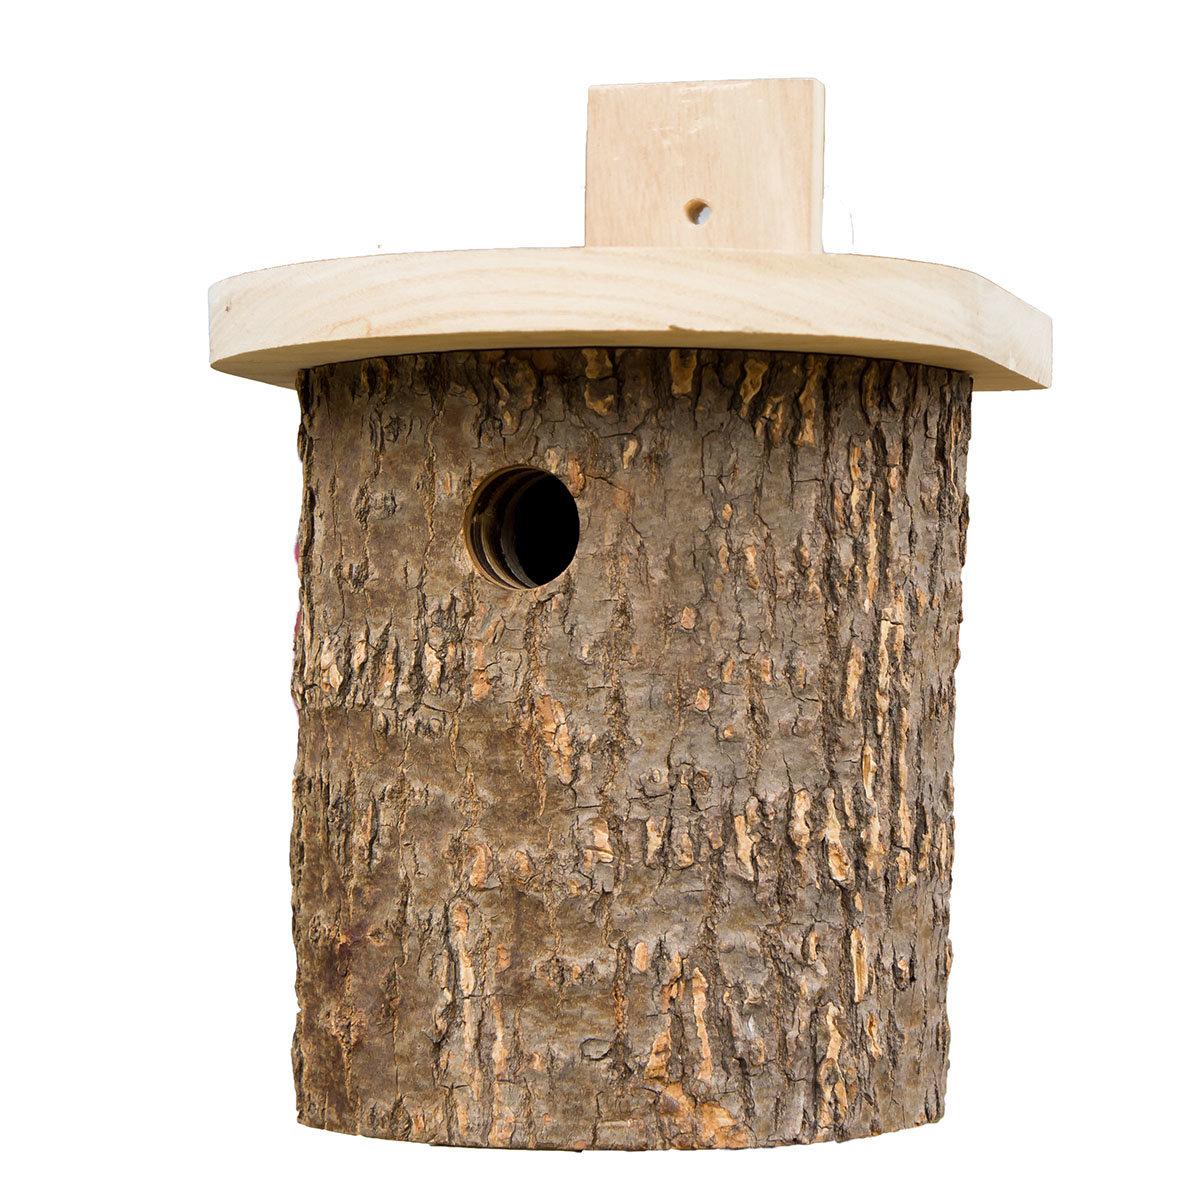 Kleinvogel-Nistkasten Woody | #3